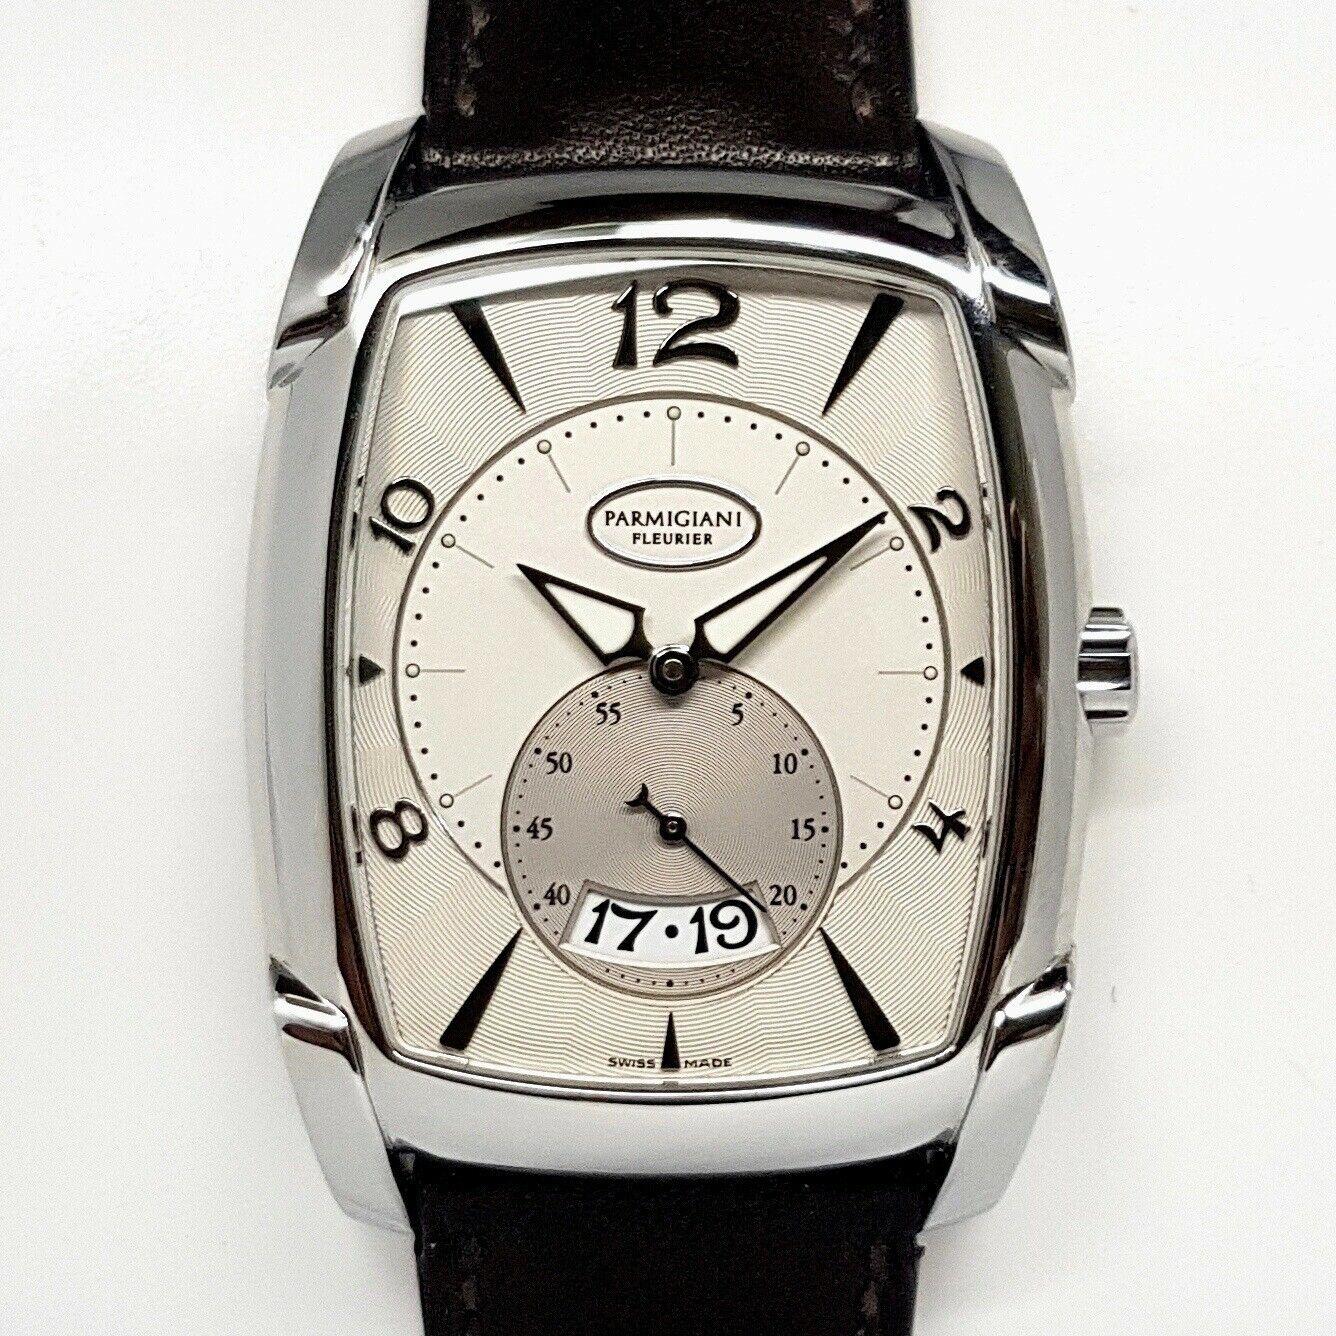 Stainless Steel Parmigiani Fleurier Kalpa XL PF013474 - watch picture 1